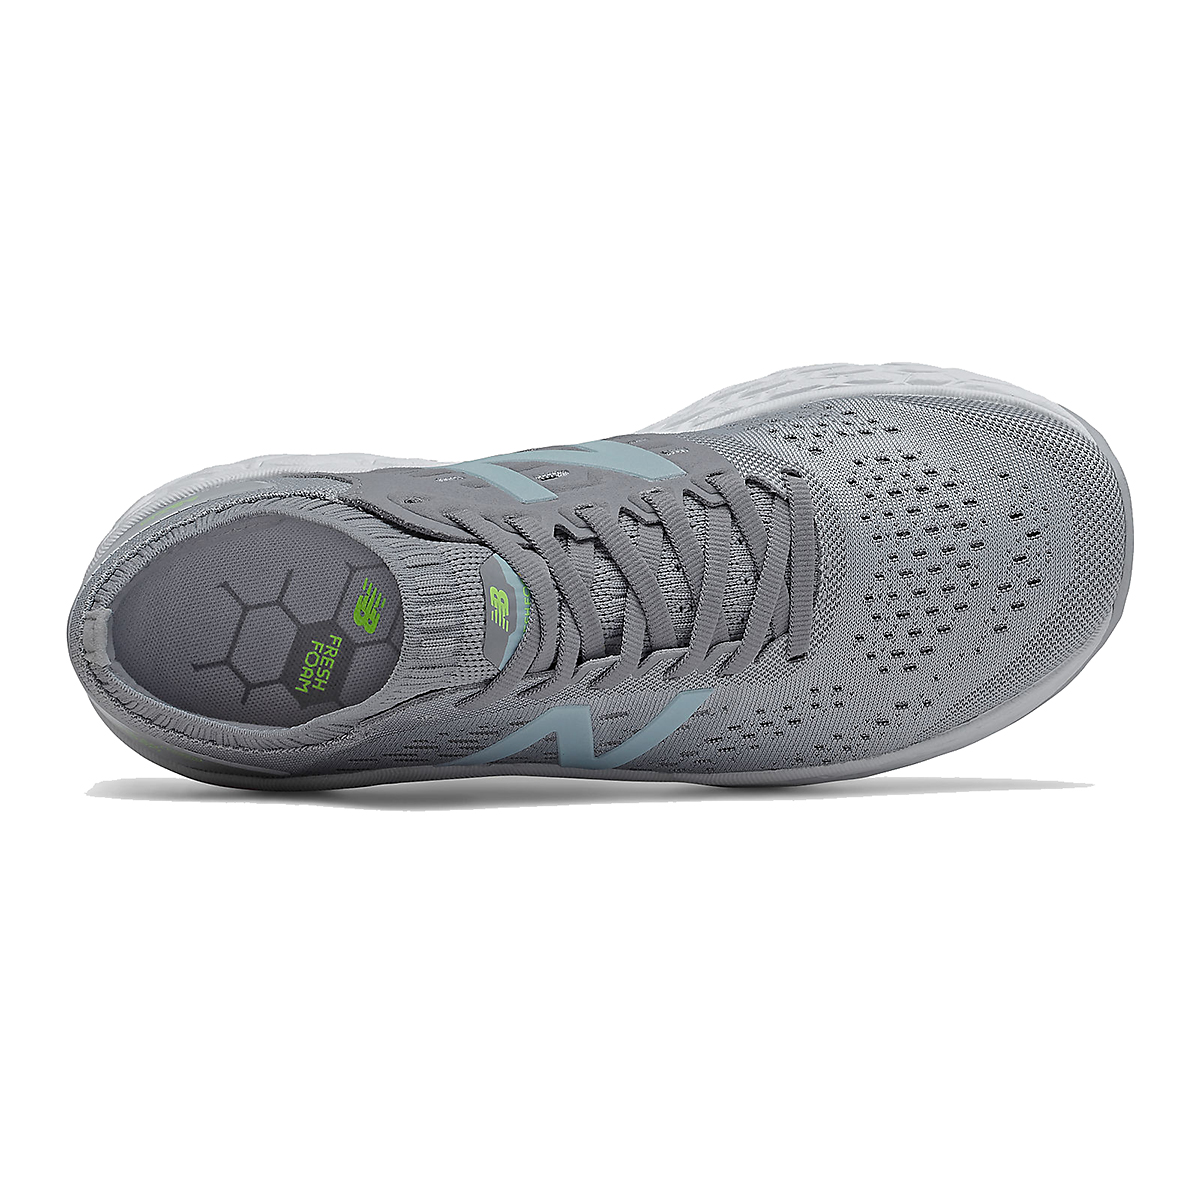 Women's New Balance Fresh Foam Vongo V4 Running Shoe - Color: Light Aluminum - Size: 5.5 - Width: Regular, Light Aluminum, large, image 4